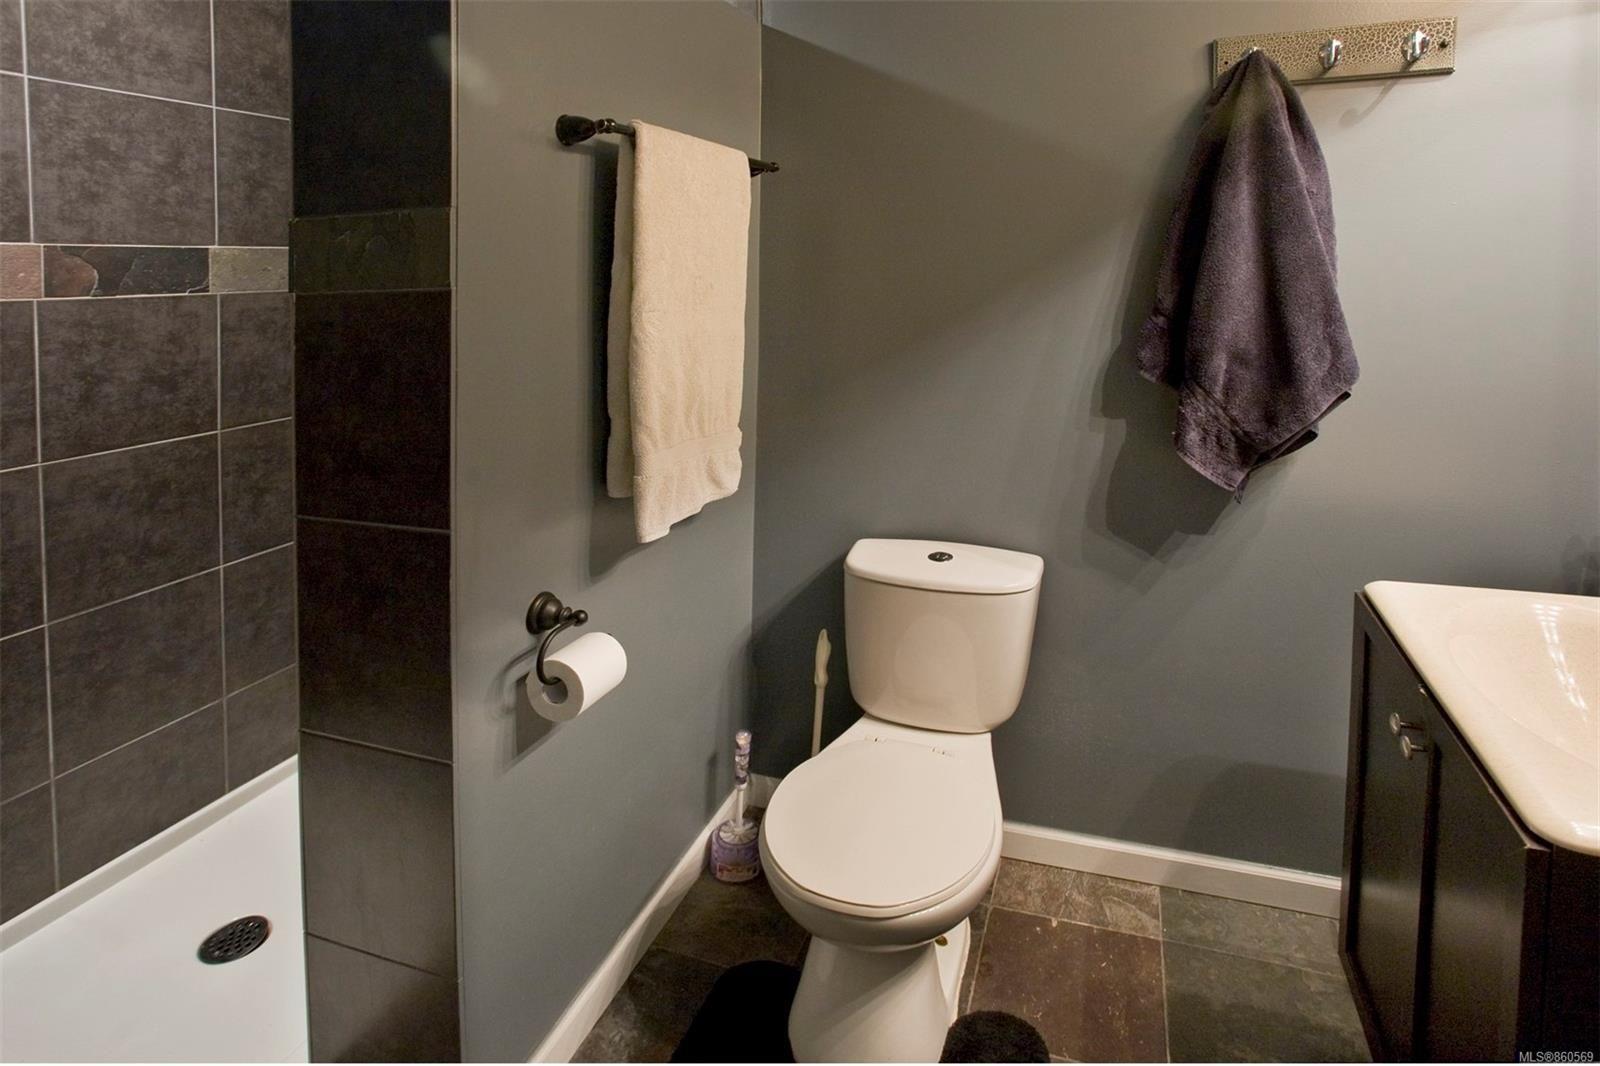 Photo 11: Photos: 4156 Ravenhill Ave in : PA Port Alberni House for sale (Port Alberni)  : MLS®# 860569